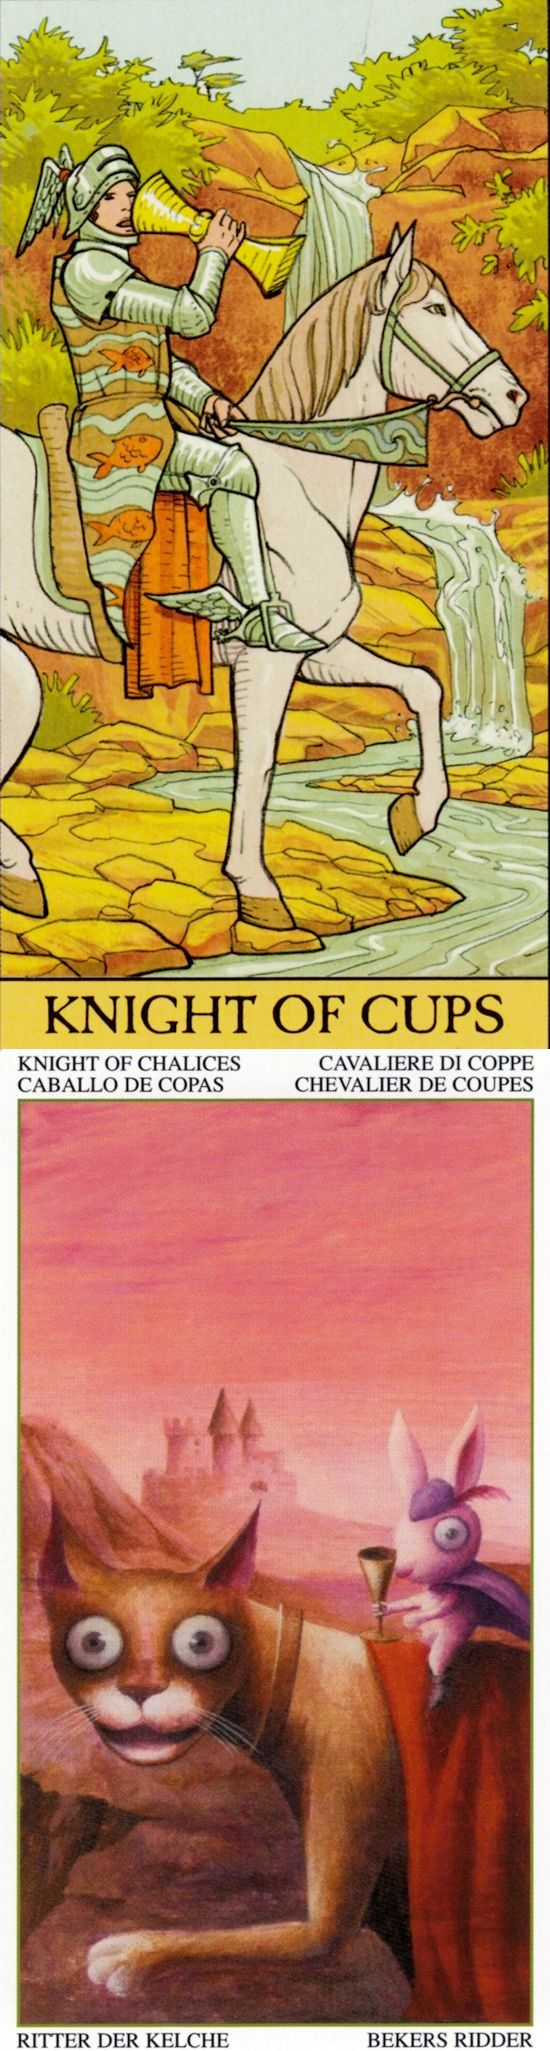 Knight of Cups: romance and moodiness (reverse). After Tarot Tarot deck and Magical Tarot deck: tarotunlocking the arcana, taro on line gratis and tarotmucha. The best spells and spelljammer. #skeleton #happyhalloween #Wiccan #tarotspread